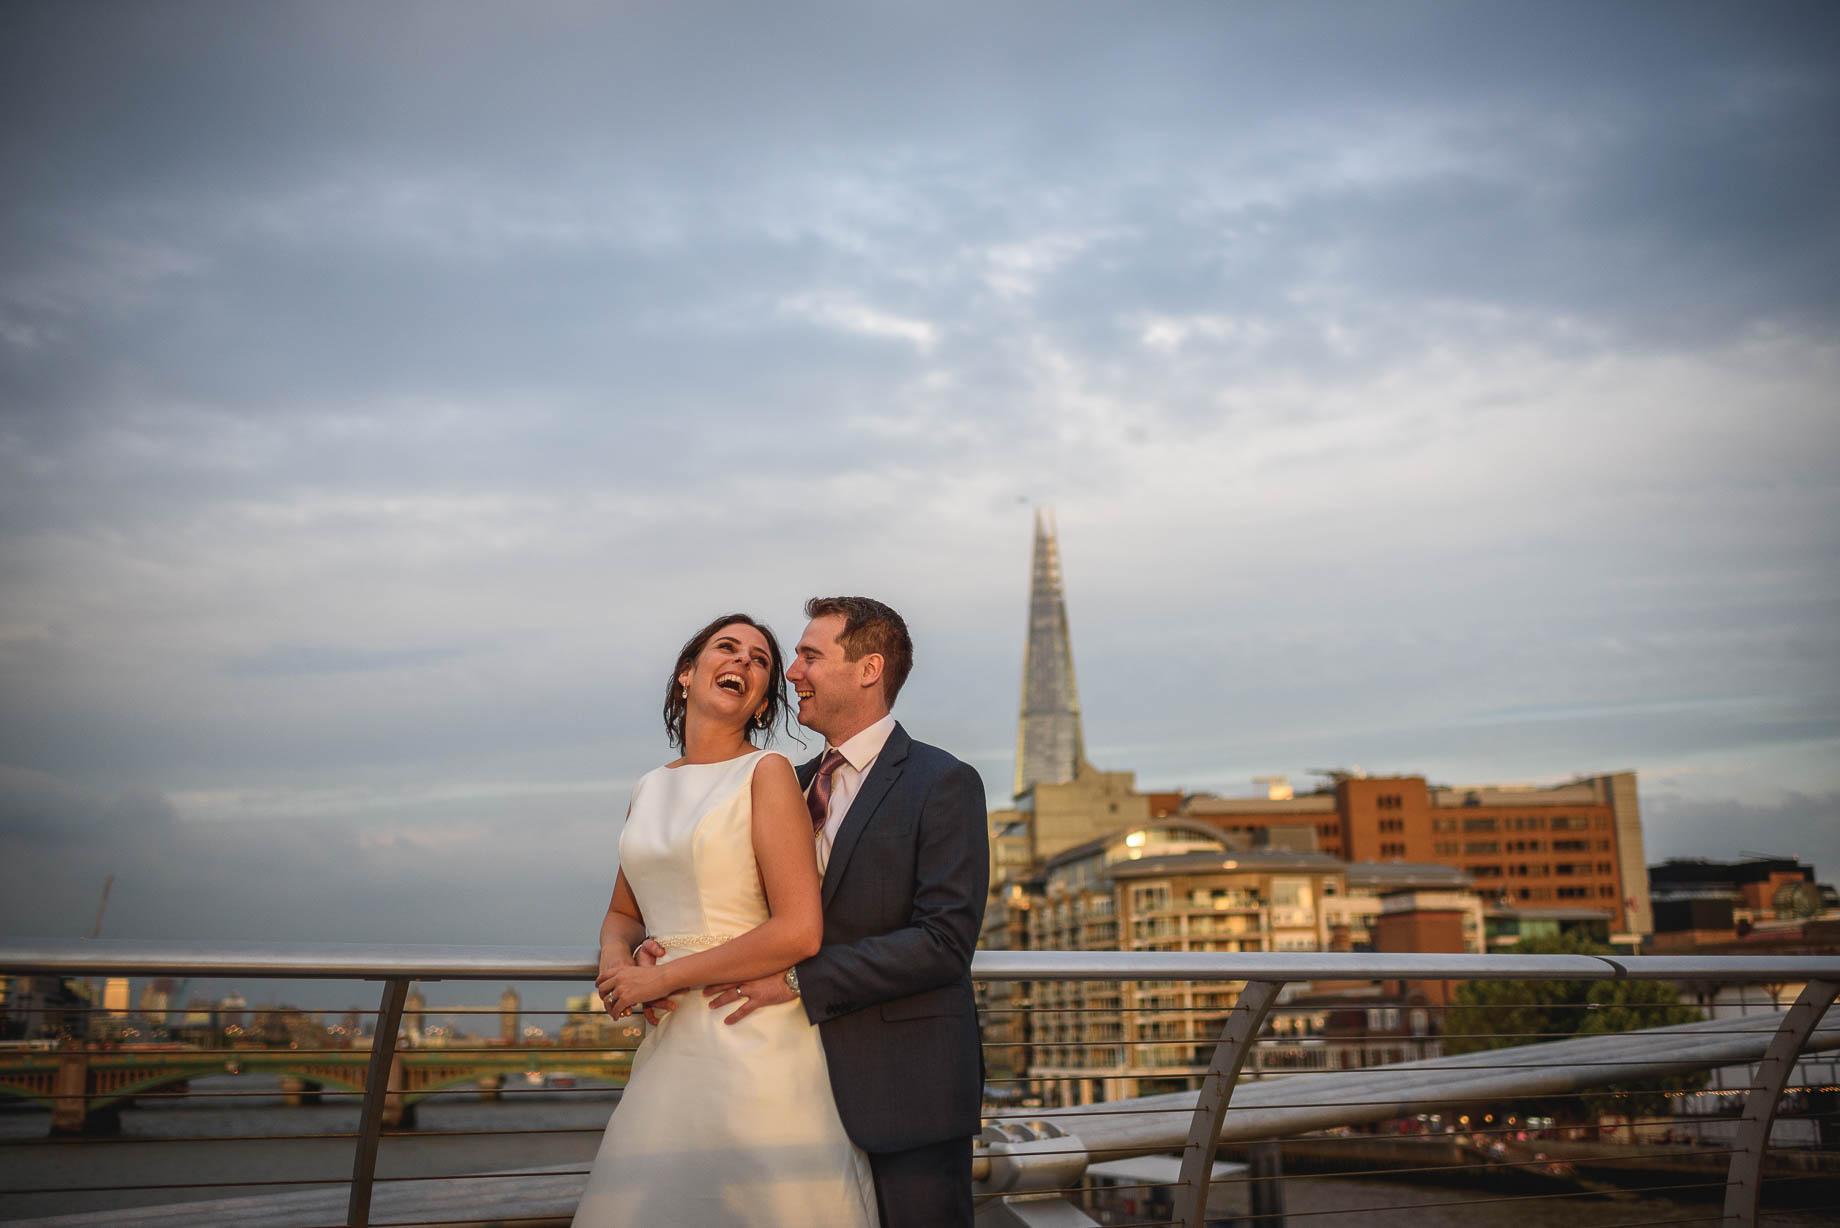 London wedding photography at The Globe - Conac + Conor